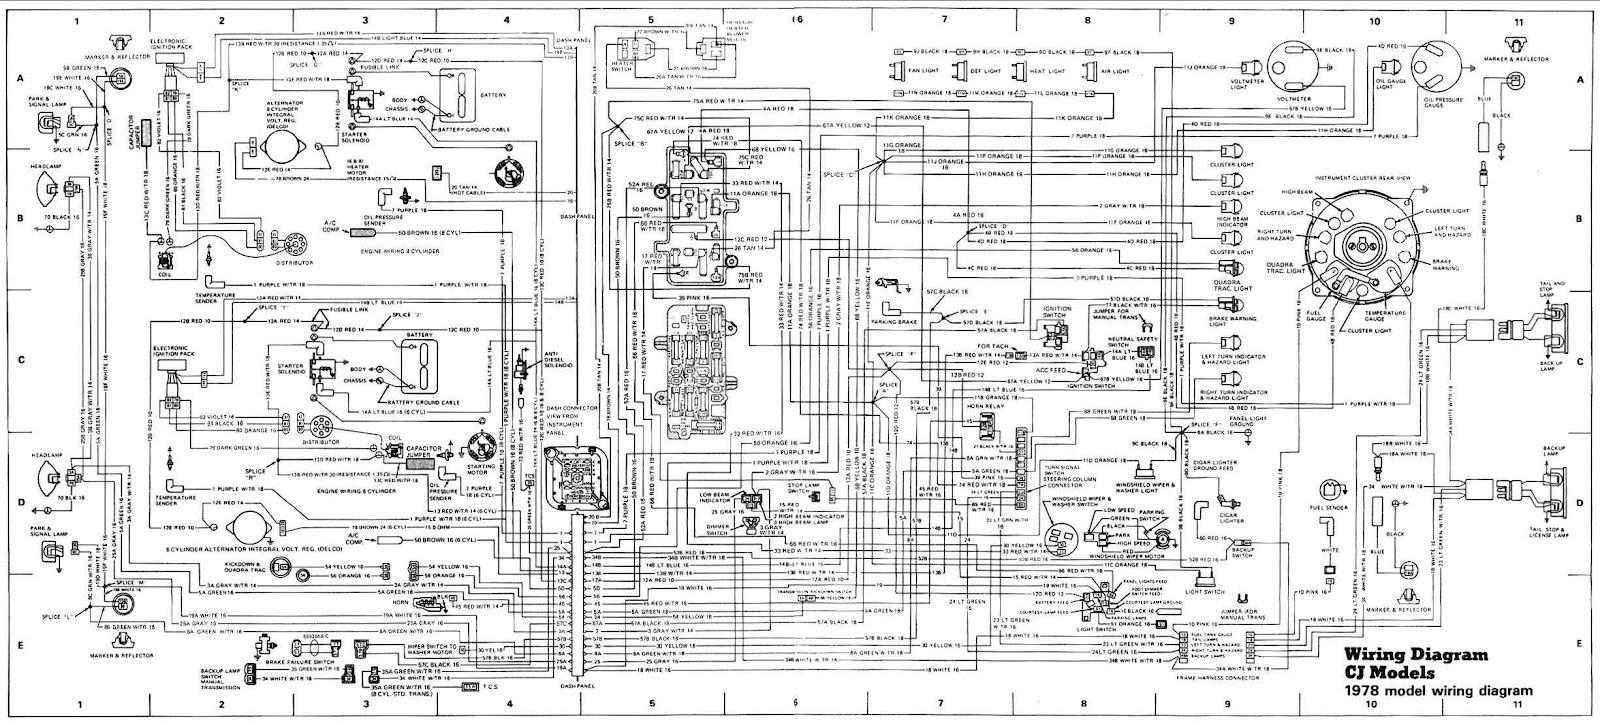 ford mustang headlight wiring diagram wirdig wiring diagram on wiring diagram for 2006 jeep grand cherokee